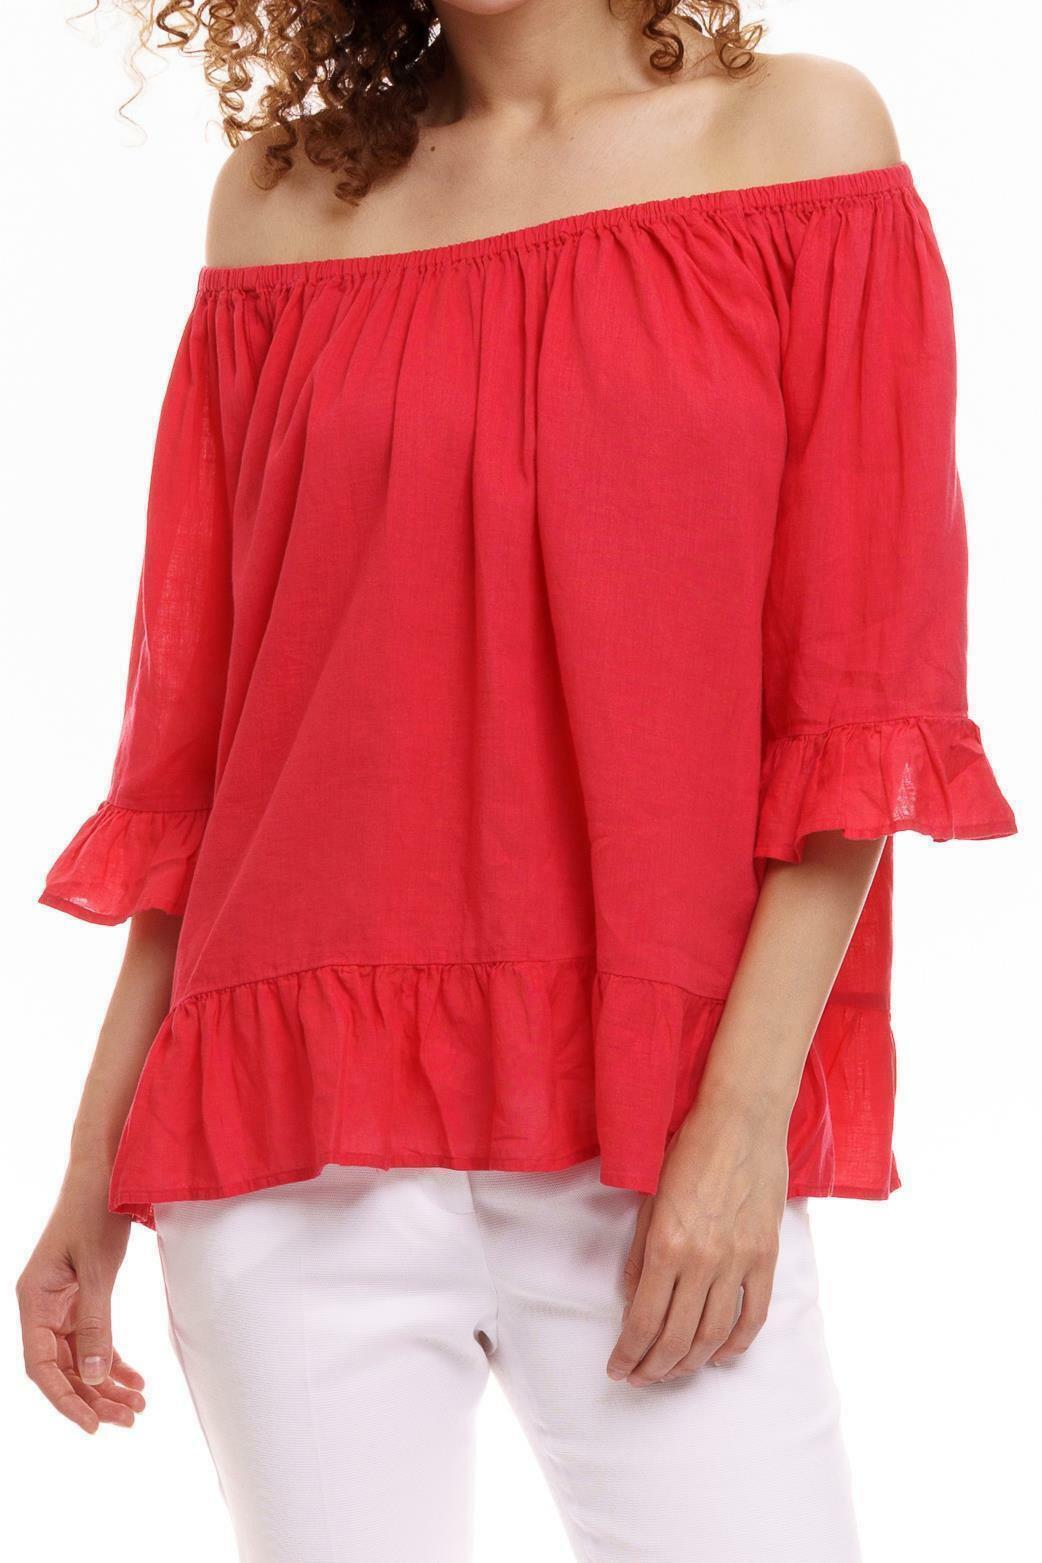 Witty Knitters - Ruffle Shirt Damen Rosa Blause Oberteil Tunika kurzarm Neu